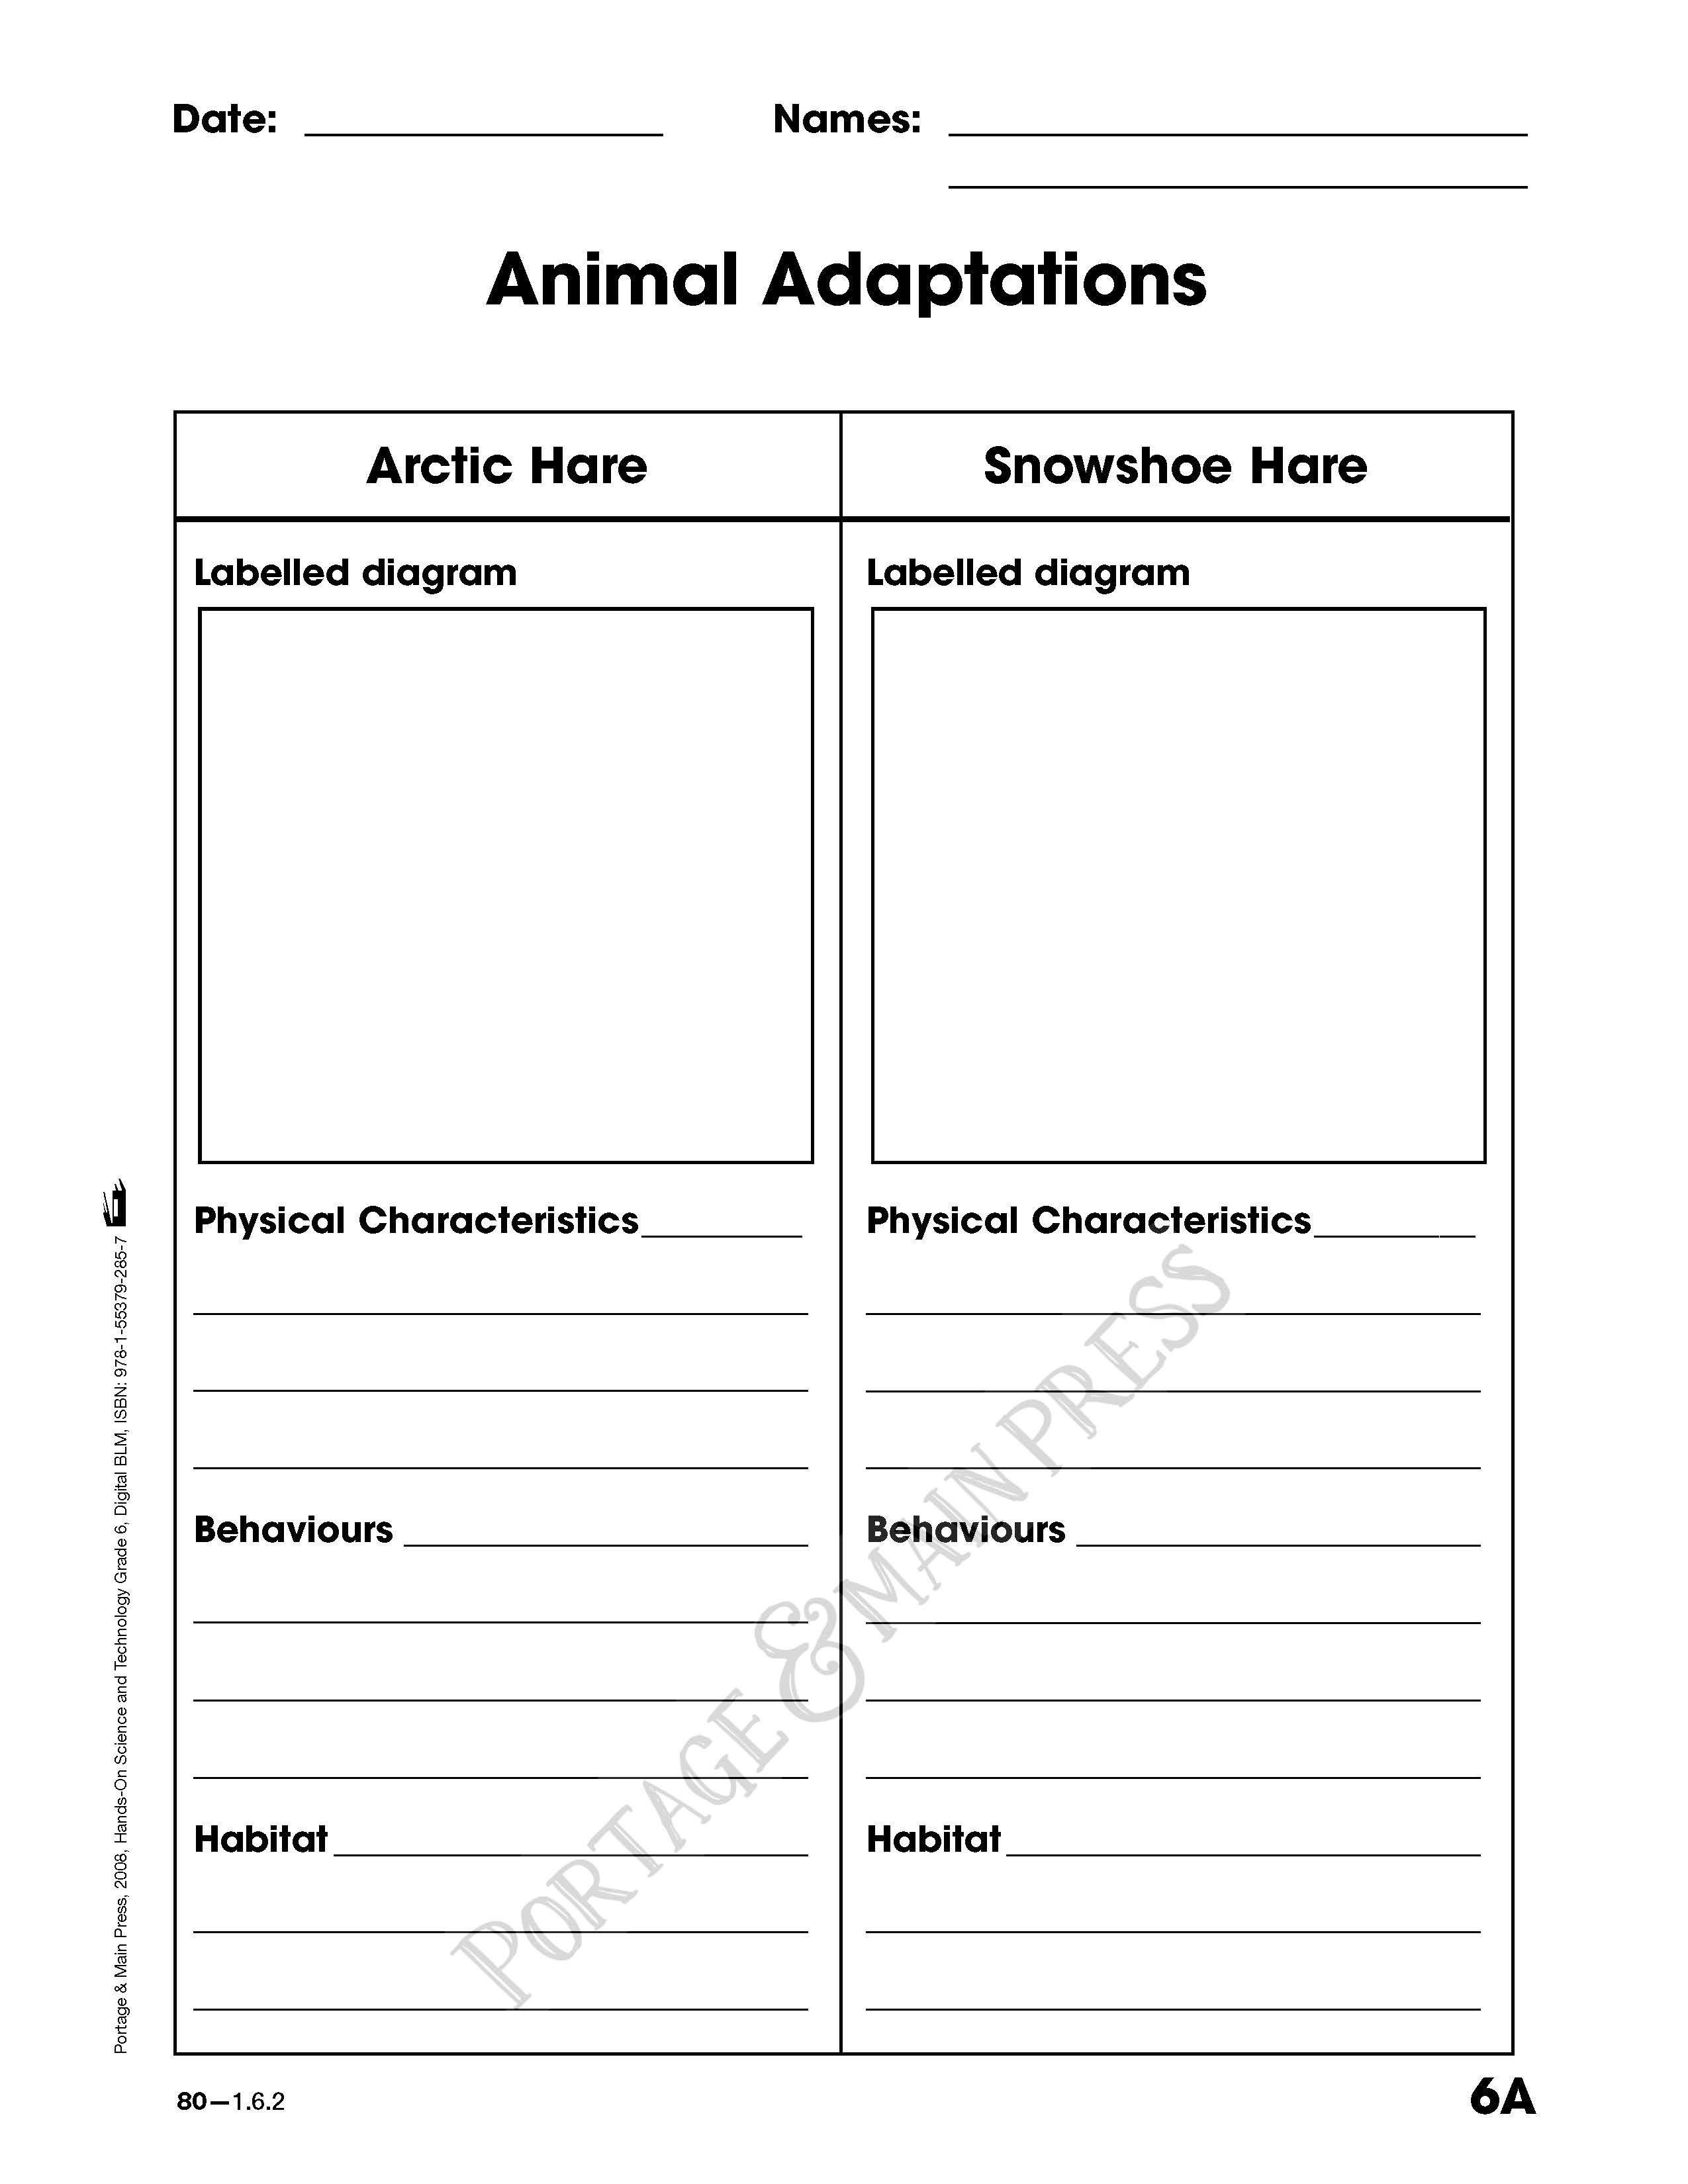 grade 6 science animal adaptions activity sheet science ideas teaching science science. Black Bedroom Furniture Sets. Home Design Ideas